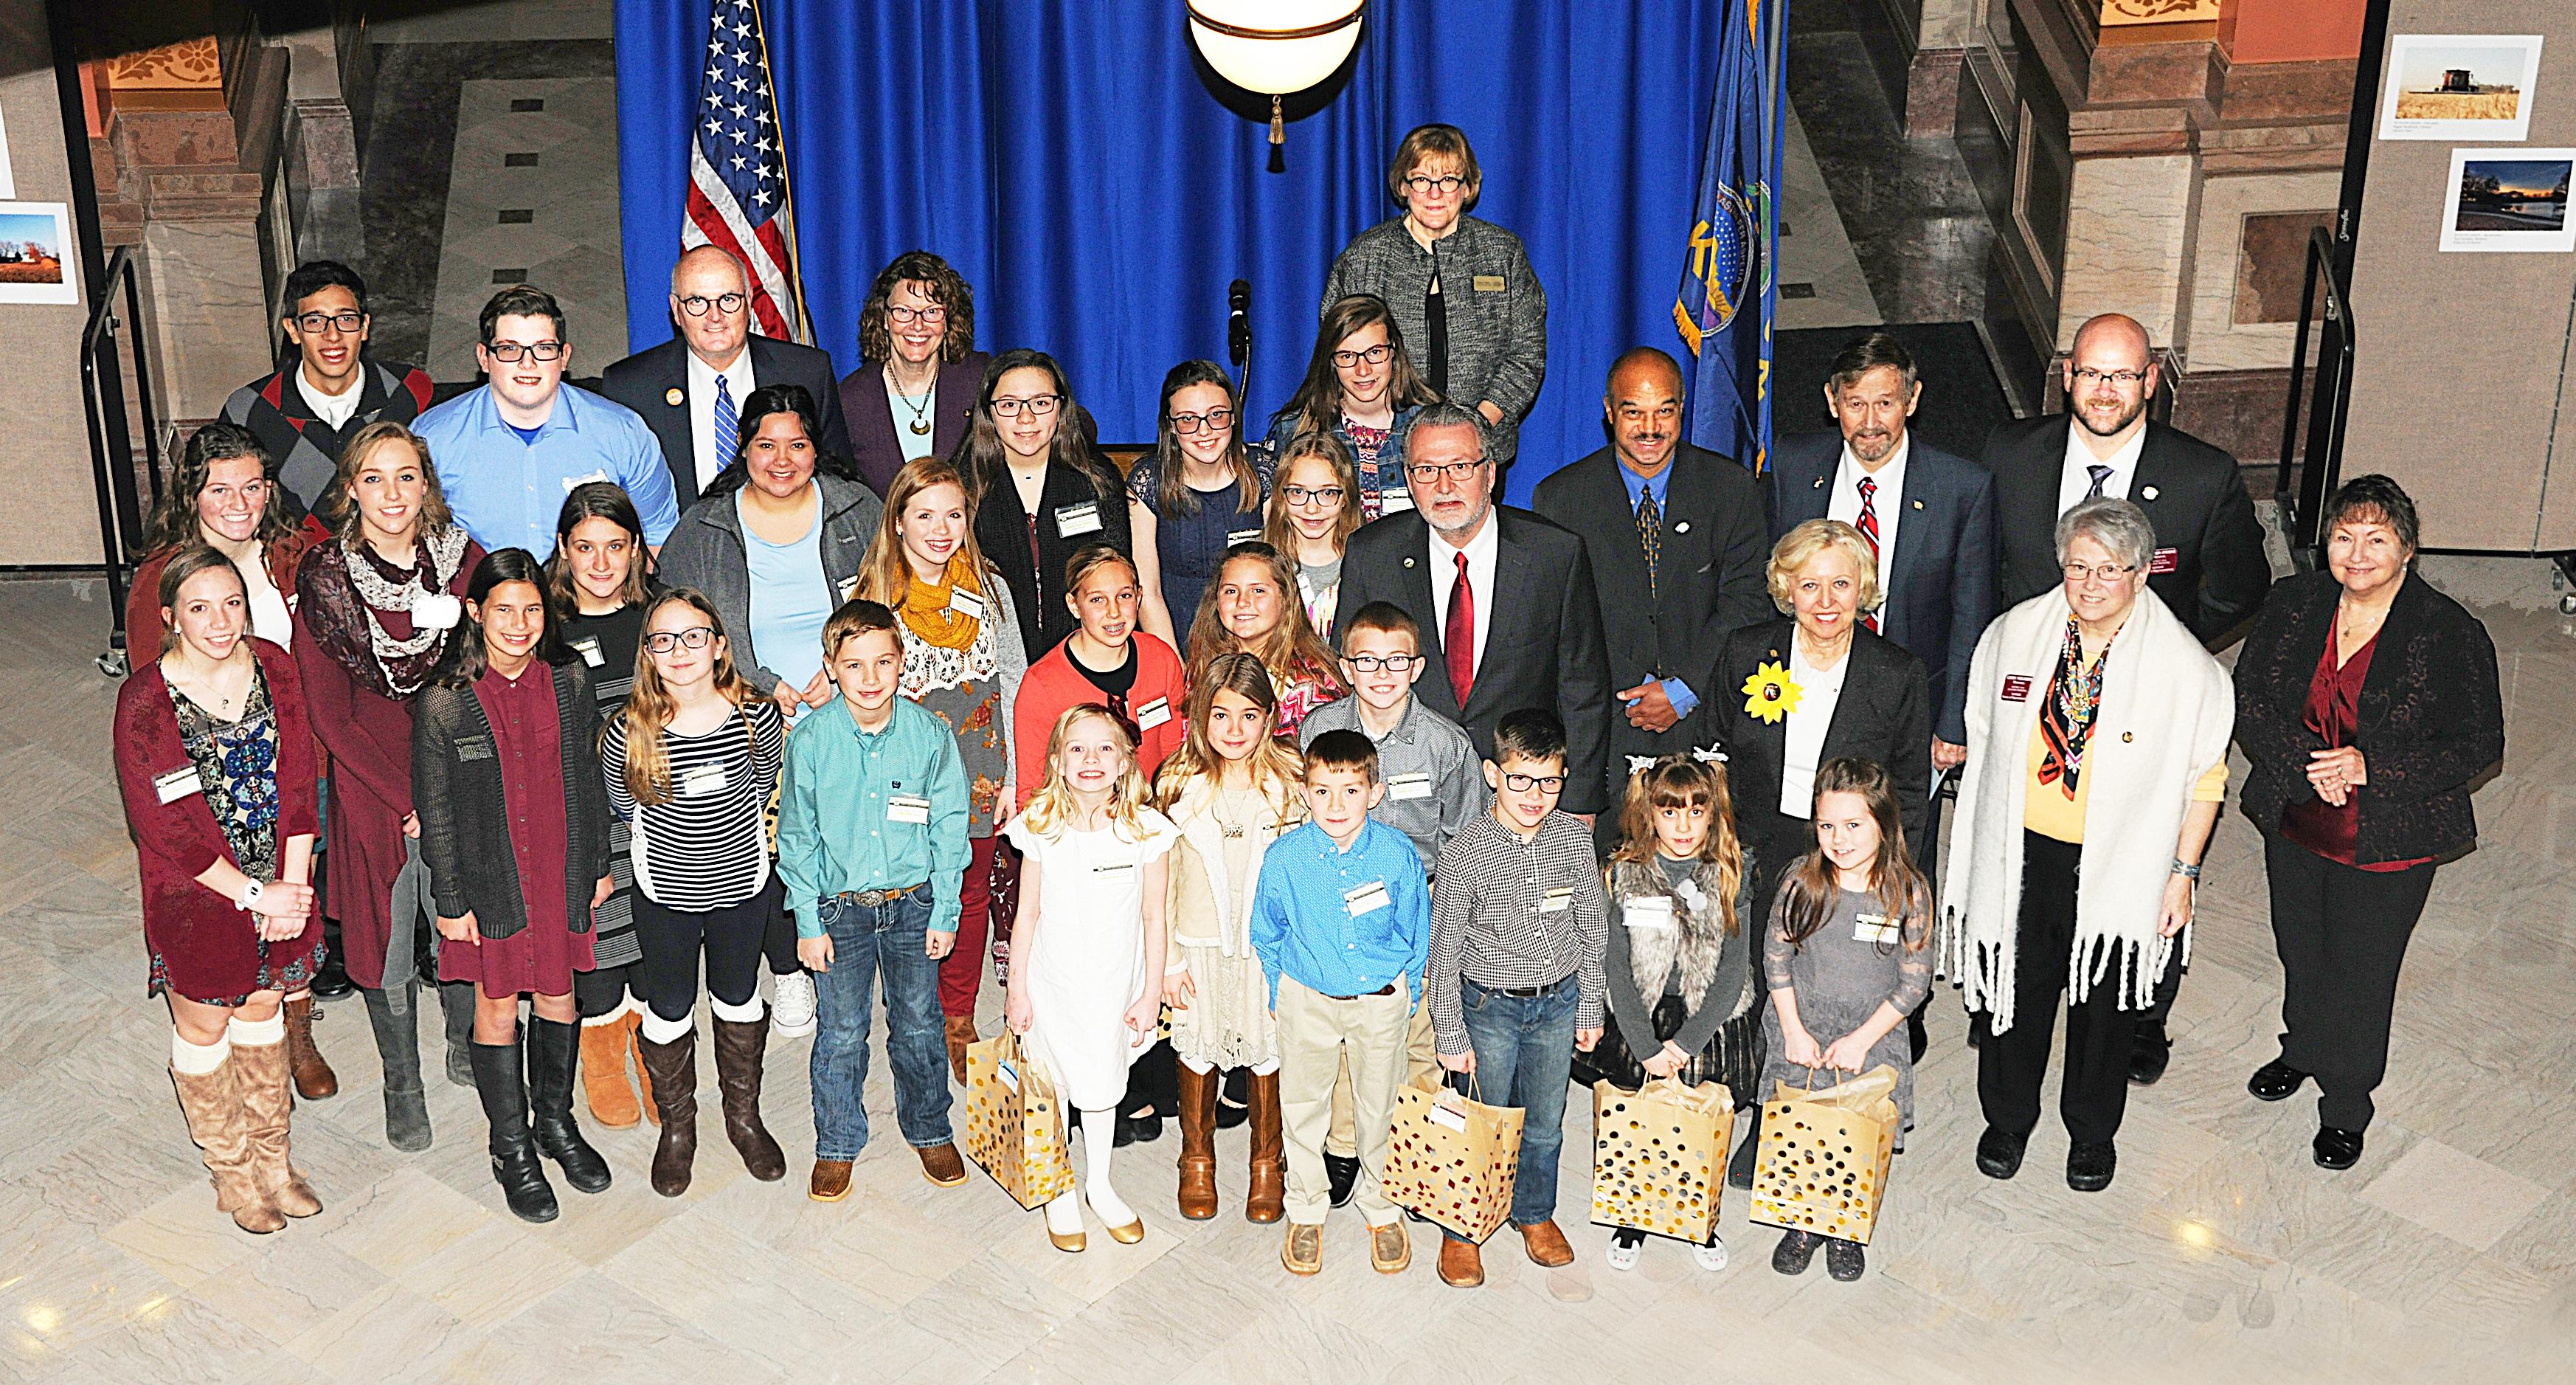 Happy Birthday, Kansas! Student Photo Contest winners January 29, 2019